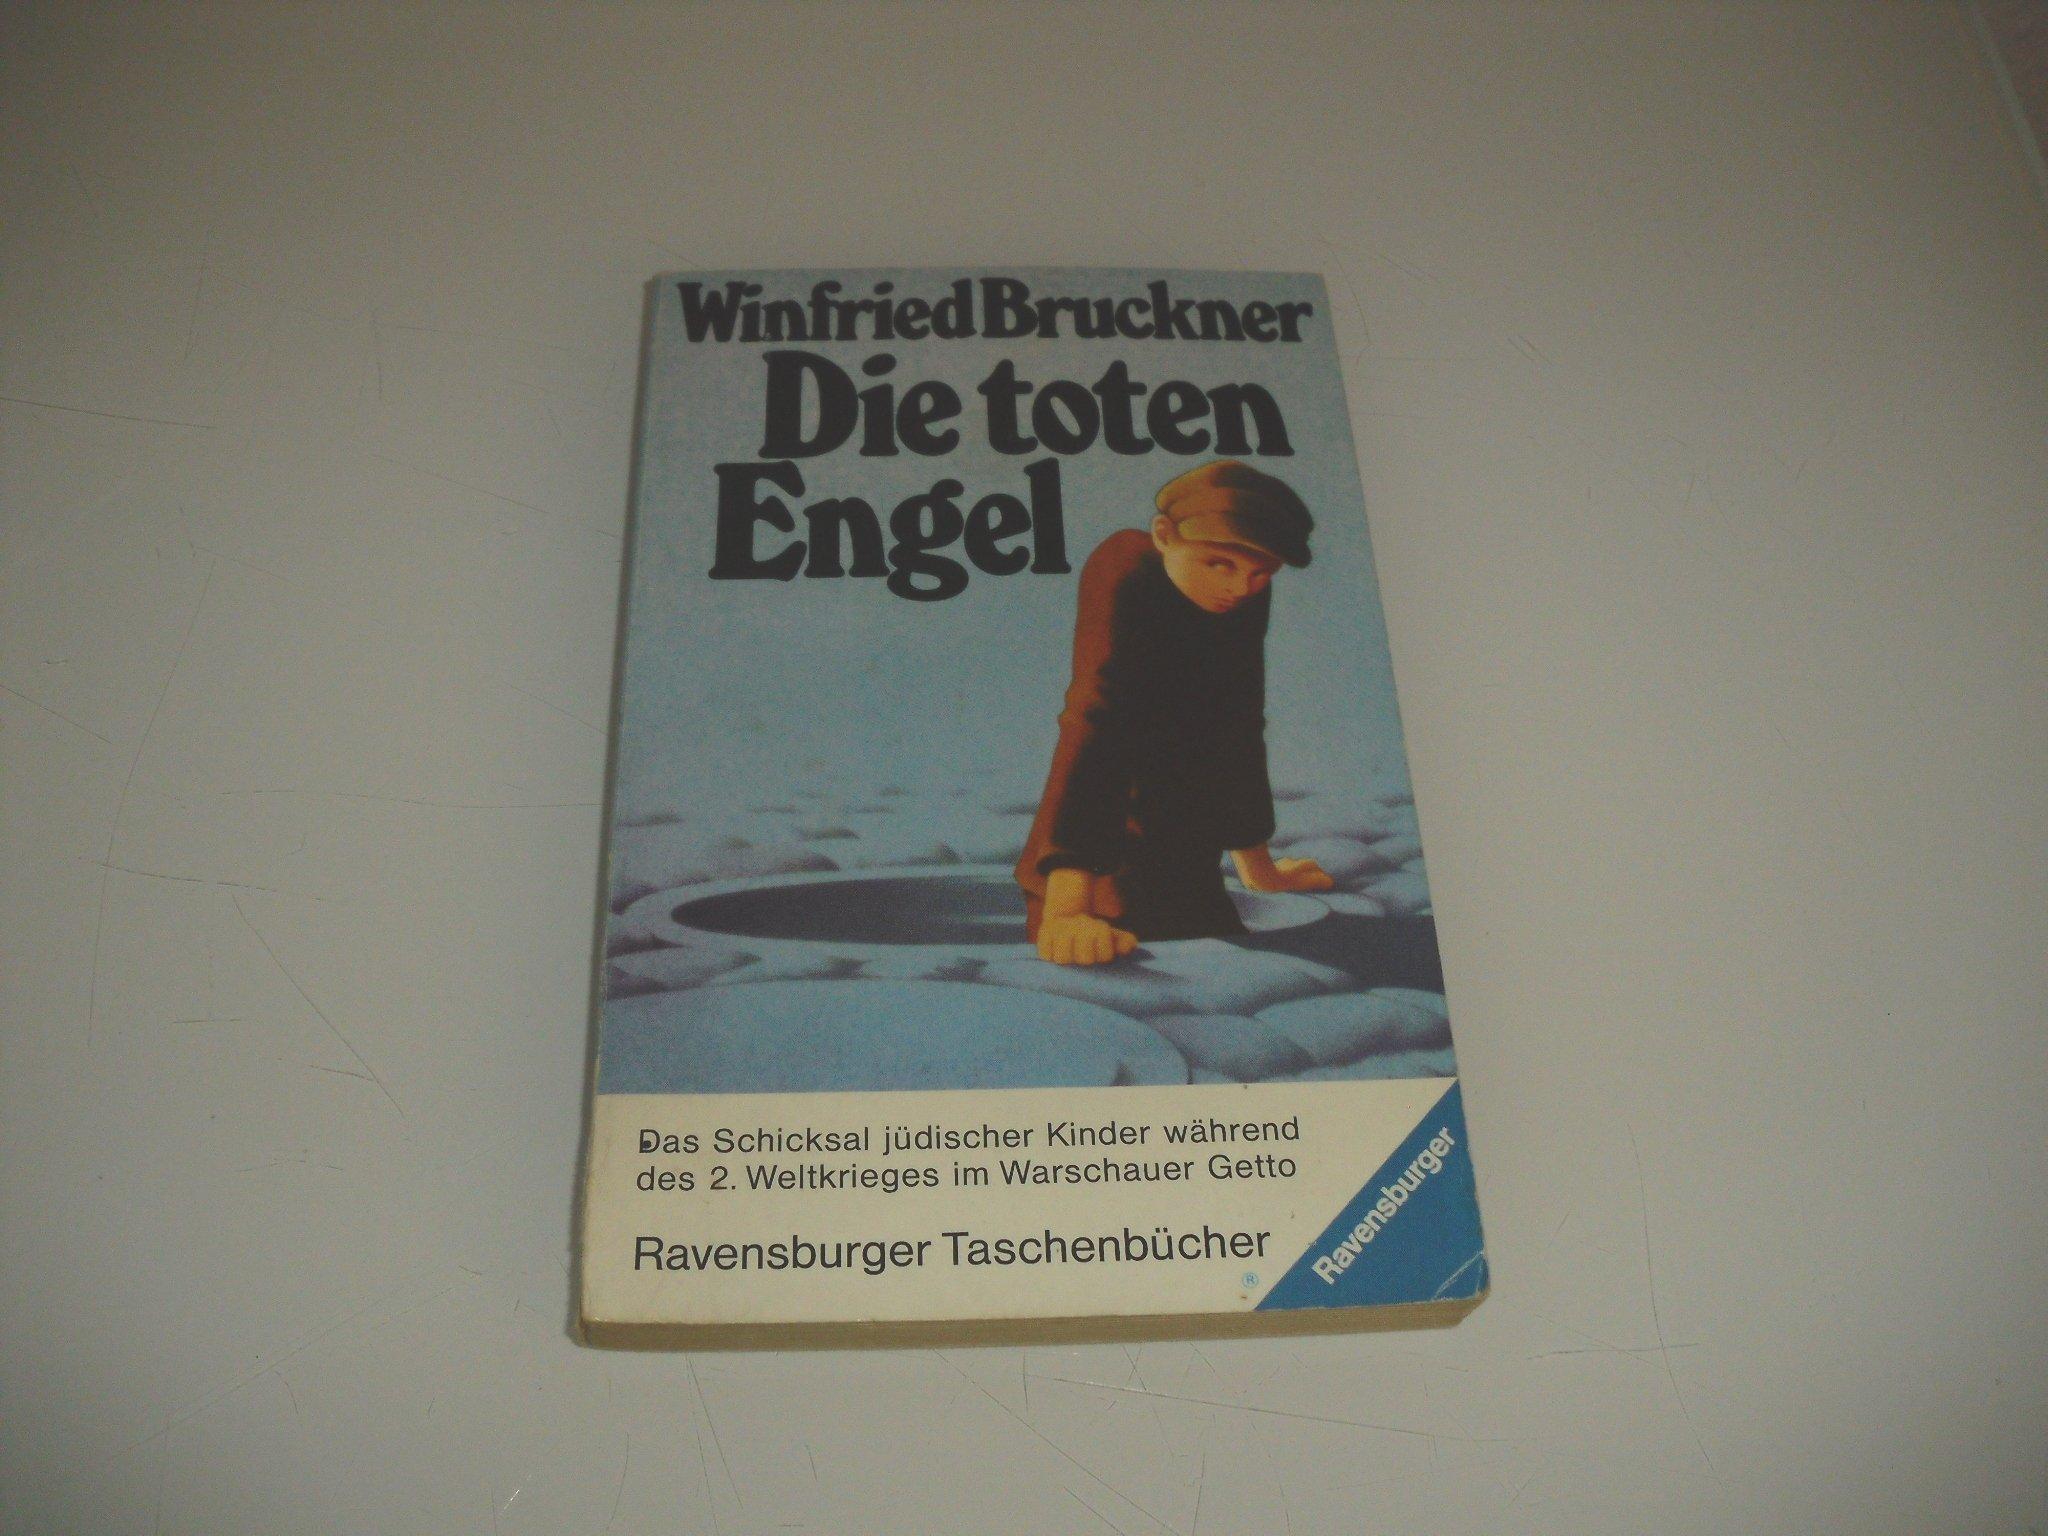 Die Toten Engel Amazon De Winfried Bruckner Bucher